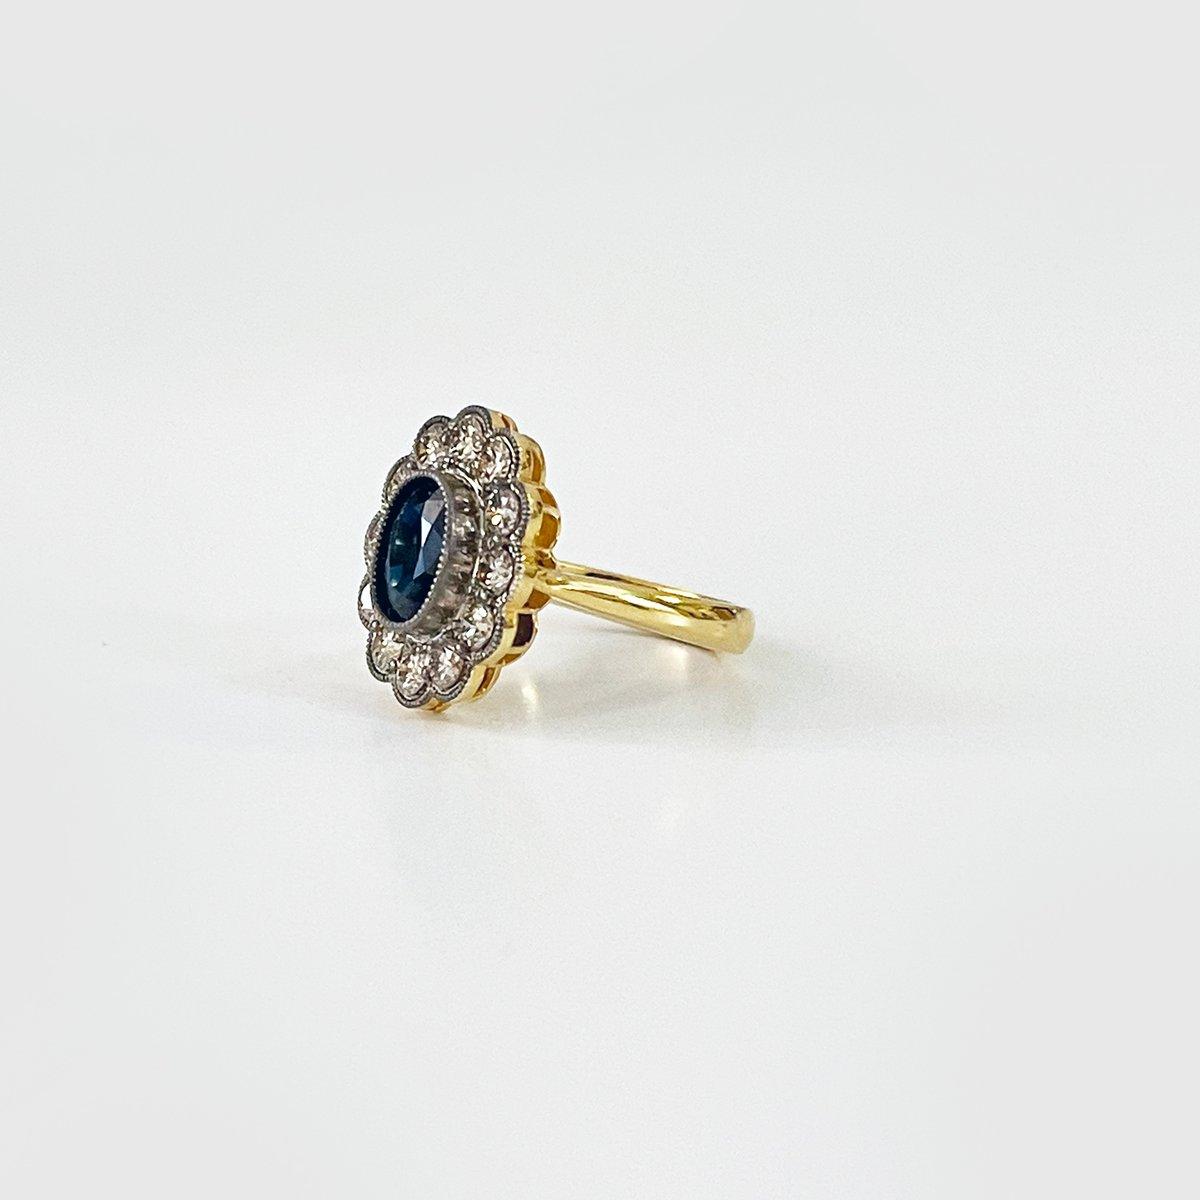 Image of D Heriloom sapphire ring